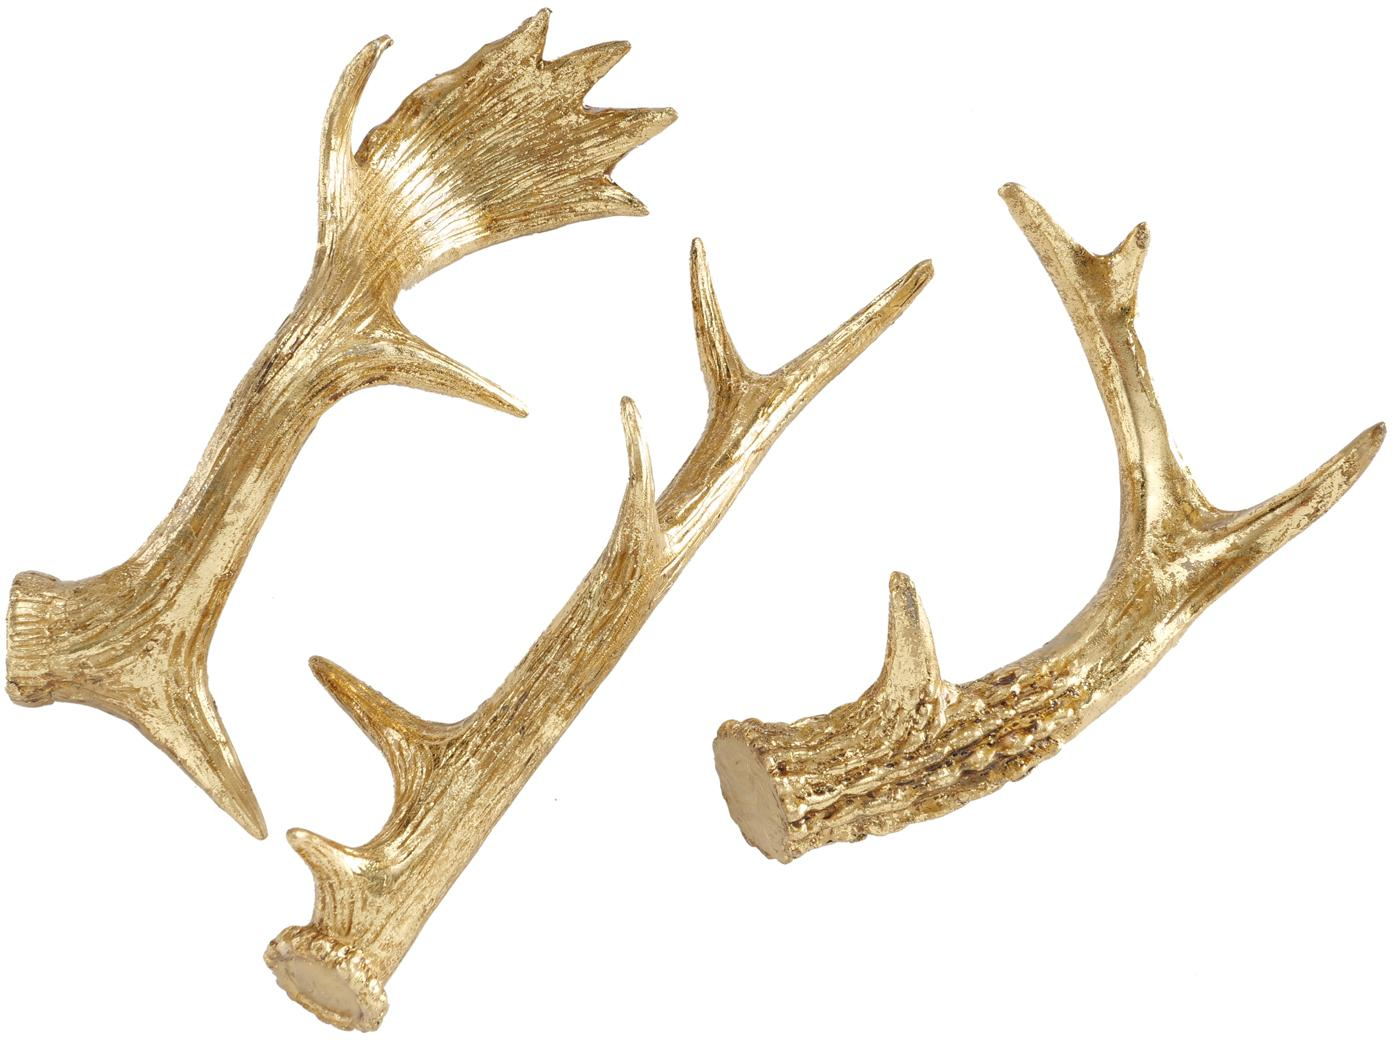 Set de piezas decorativas Geweih, 3pzas., Resina, Dorado, Set de diferentes tamaños